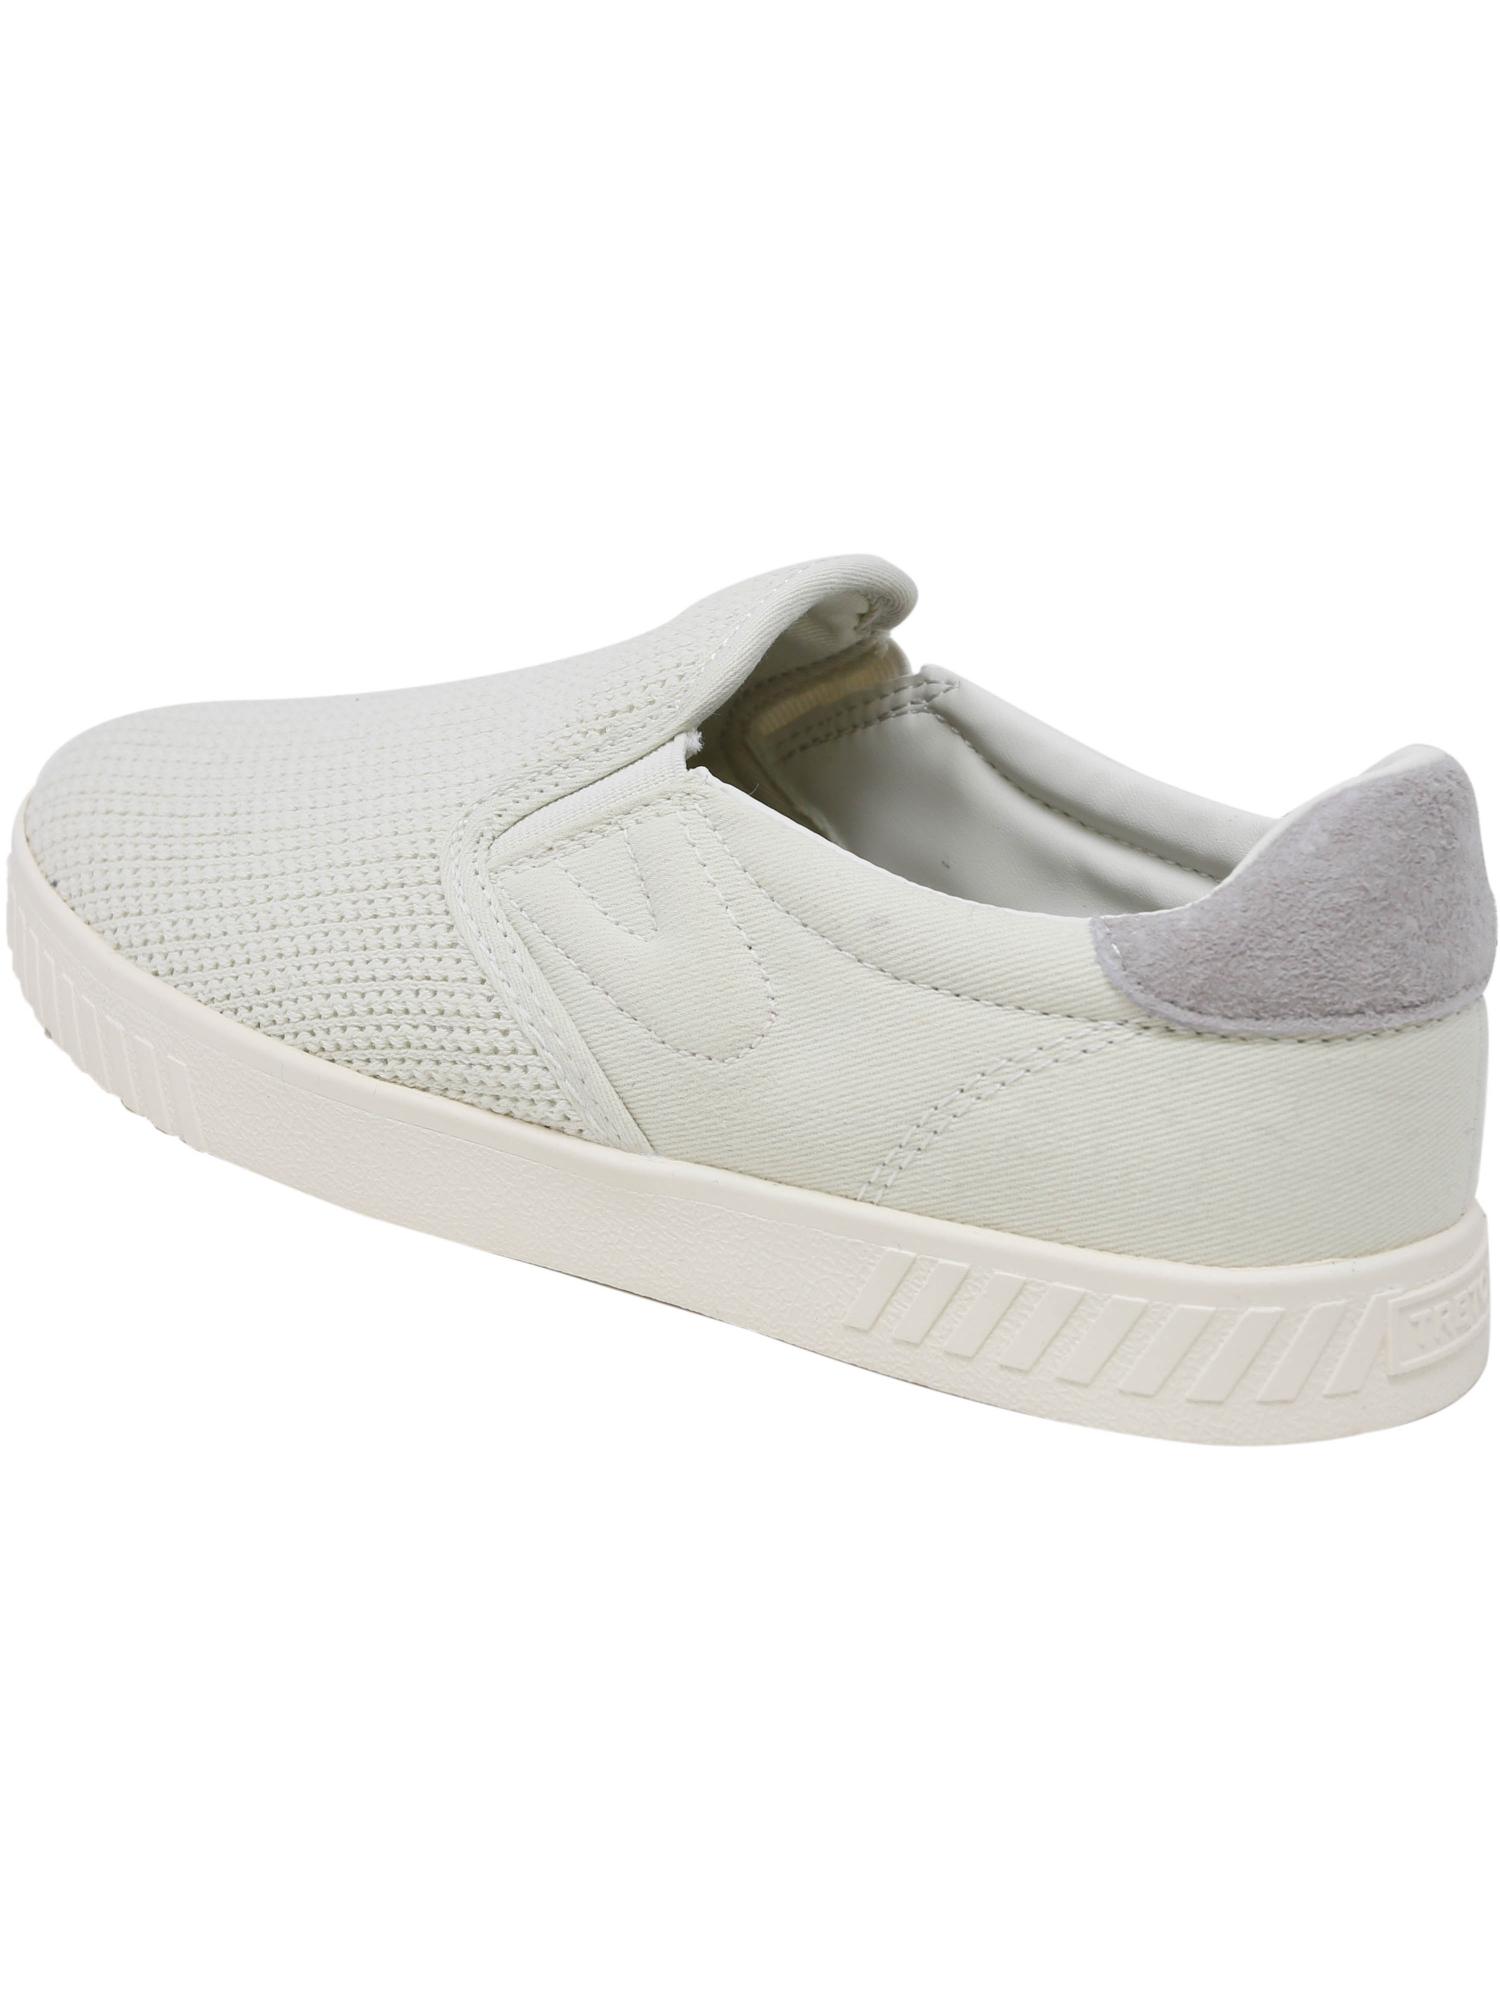 Tretorn-Femmes-Cruz-tissu-aux-chevilles-Haute-Slip-Chaussures-en miniature 14